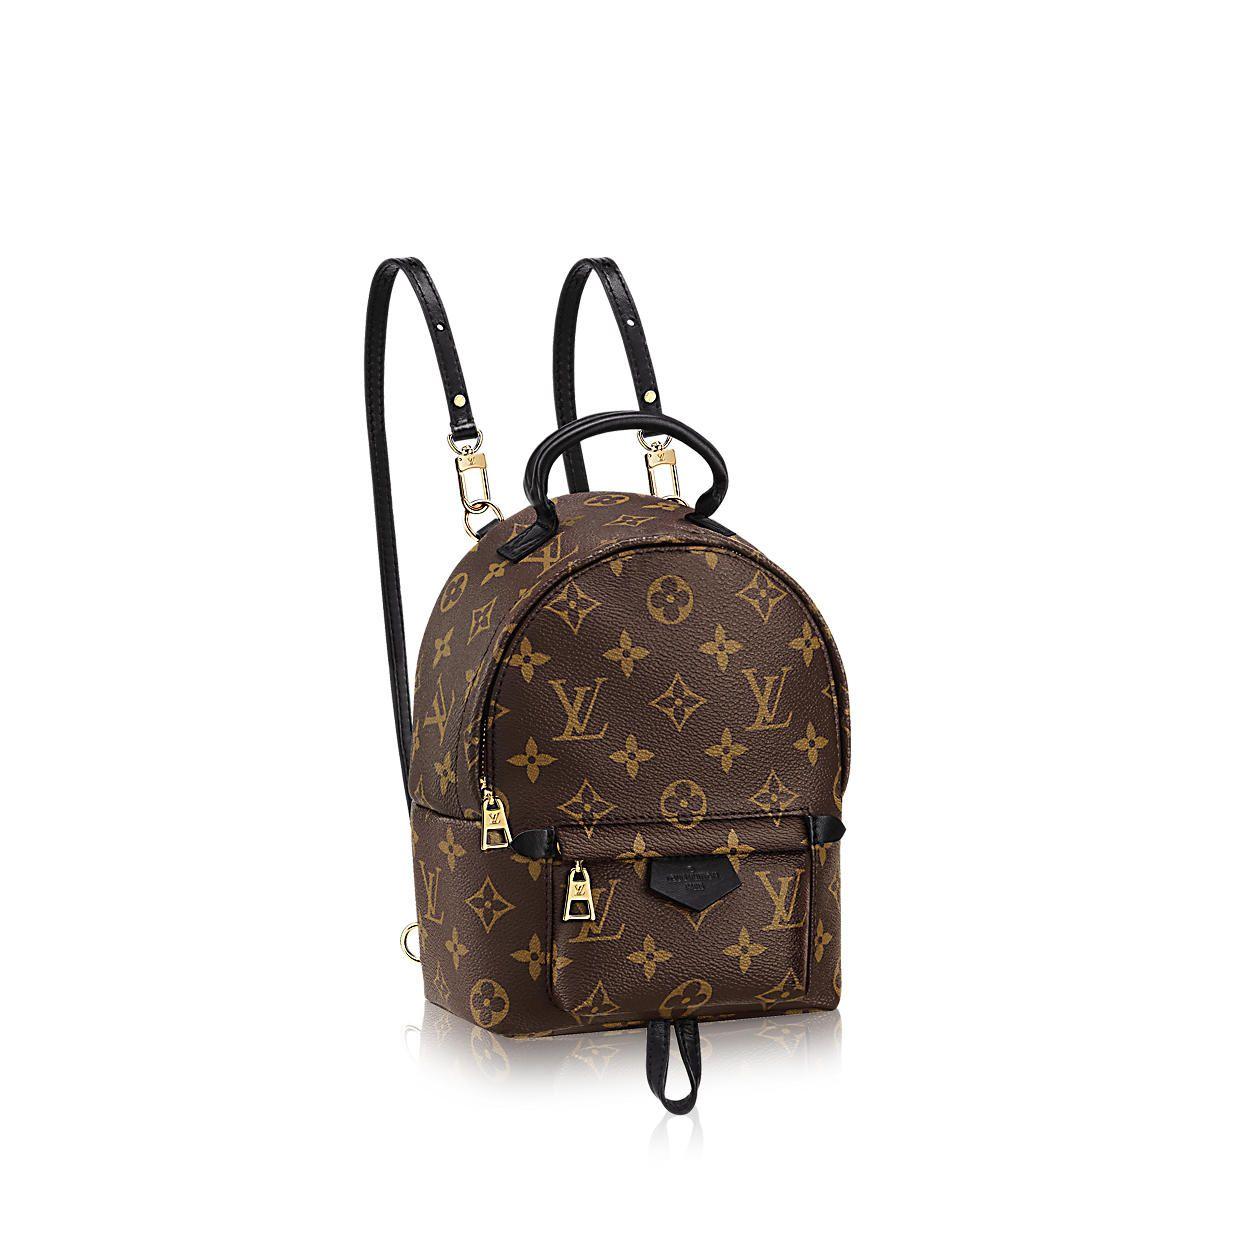 b0138426b177e Palm Springs Backpack Mini Monogram Canvas in WOMEN s HANDBAGS collections  by Louis Vuitton Louis Vuitton Handtaschen